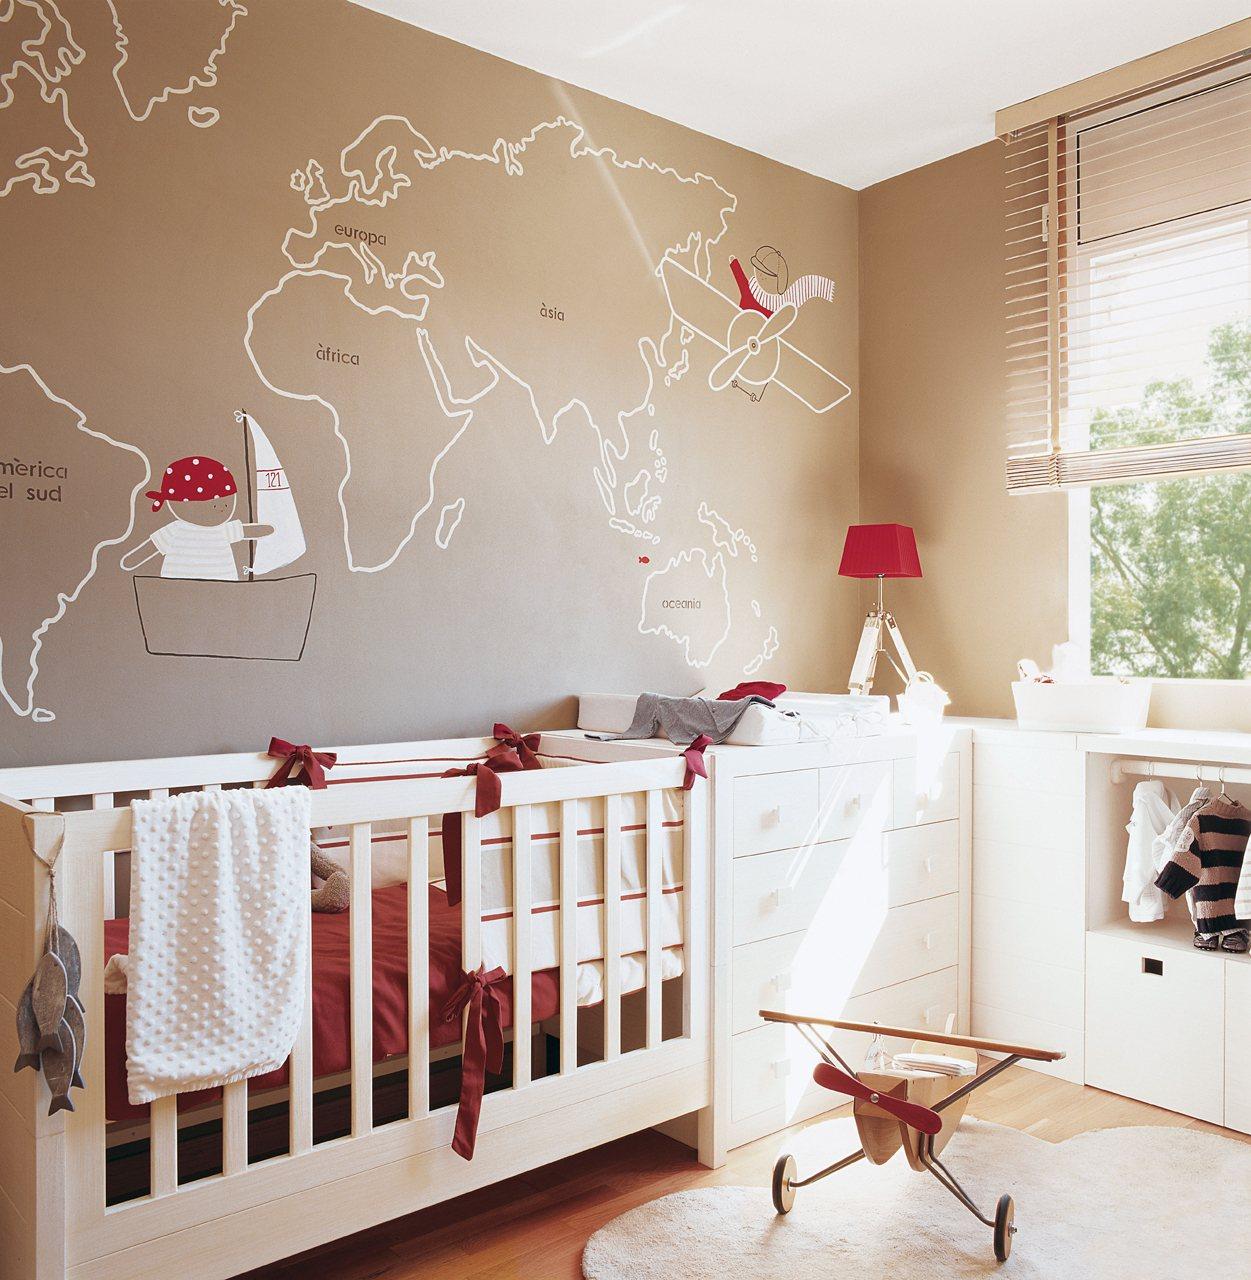 habitacion_infantil_con_mapamundi_pintado_1251x1280